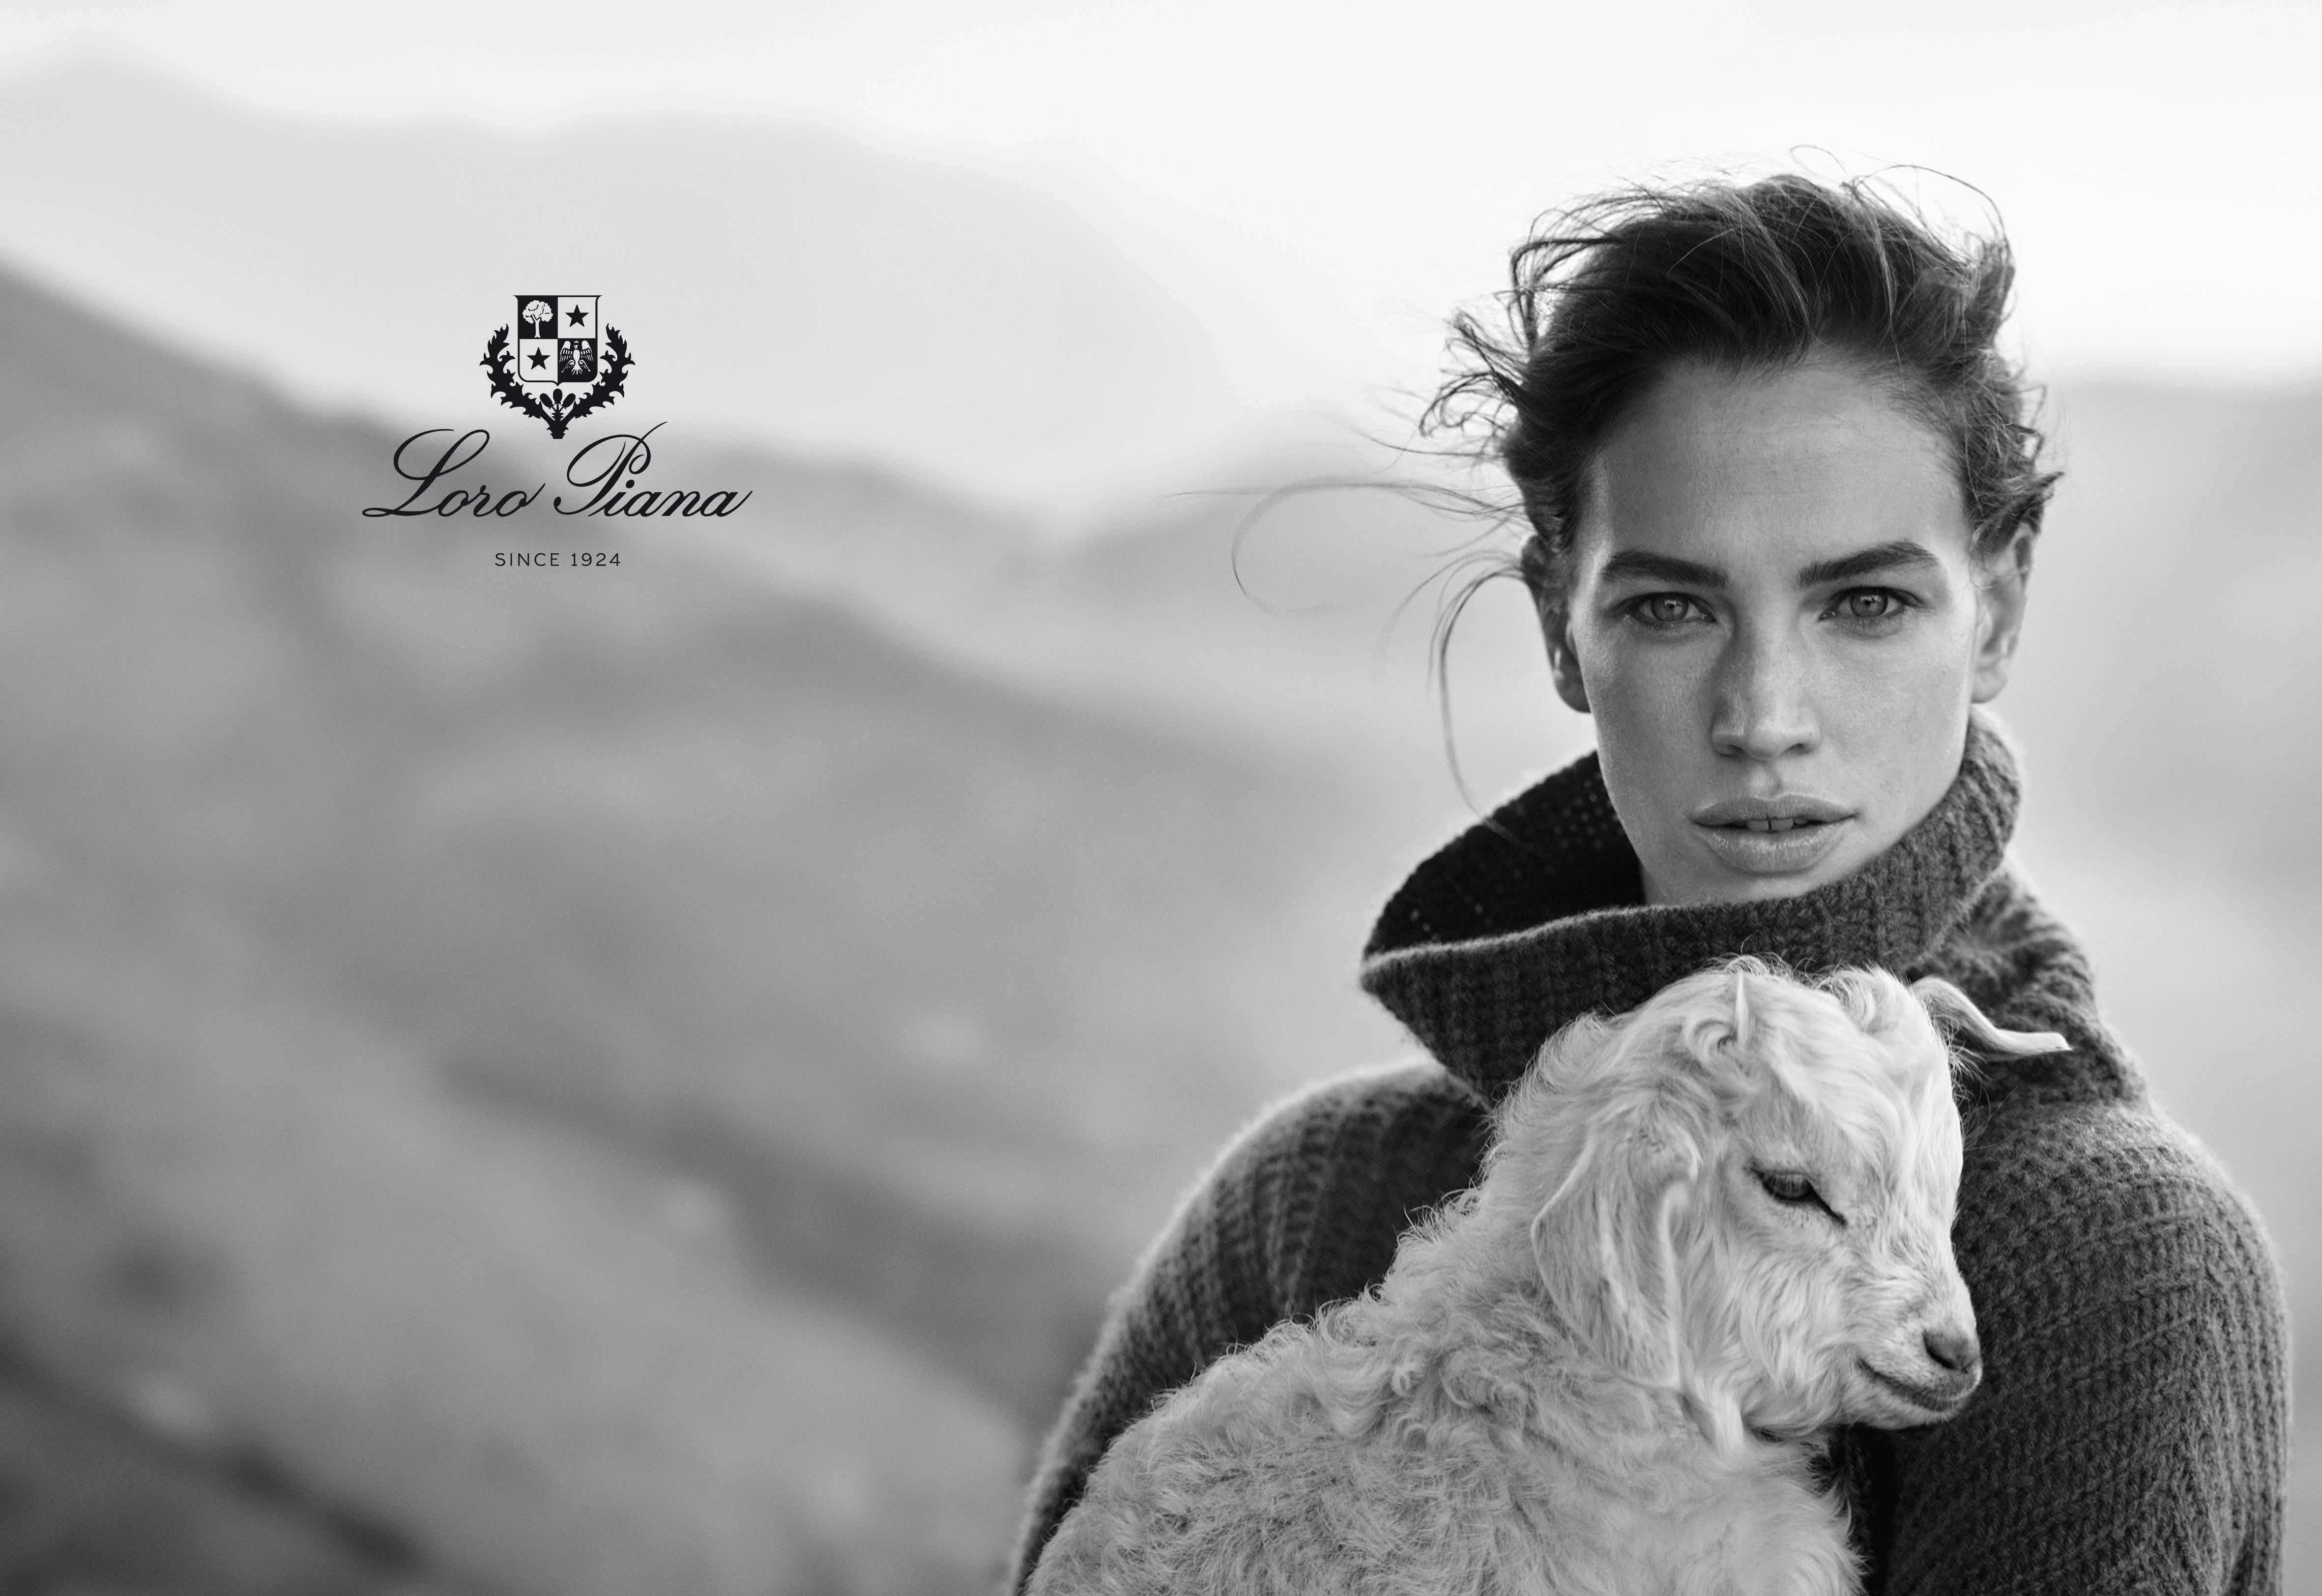 LORO PIANA - Fall Winter 16/17 Photographer: Boo George Model: Crista Cober, Robertas Aukstuolis Stylist: Beat Bollinger Location: Gran Sasso, Abruzzo, Italy